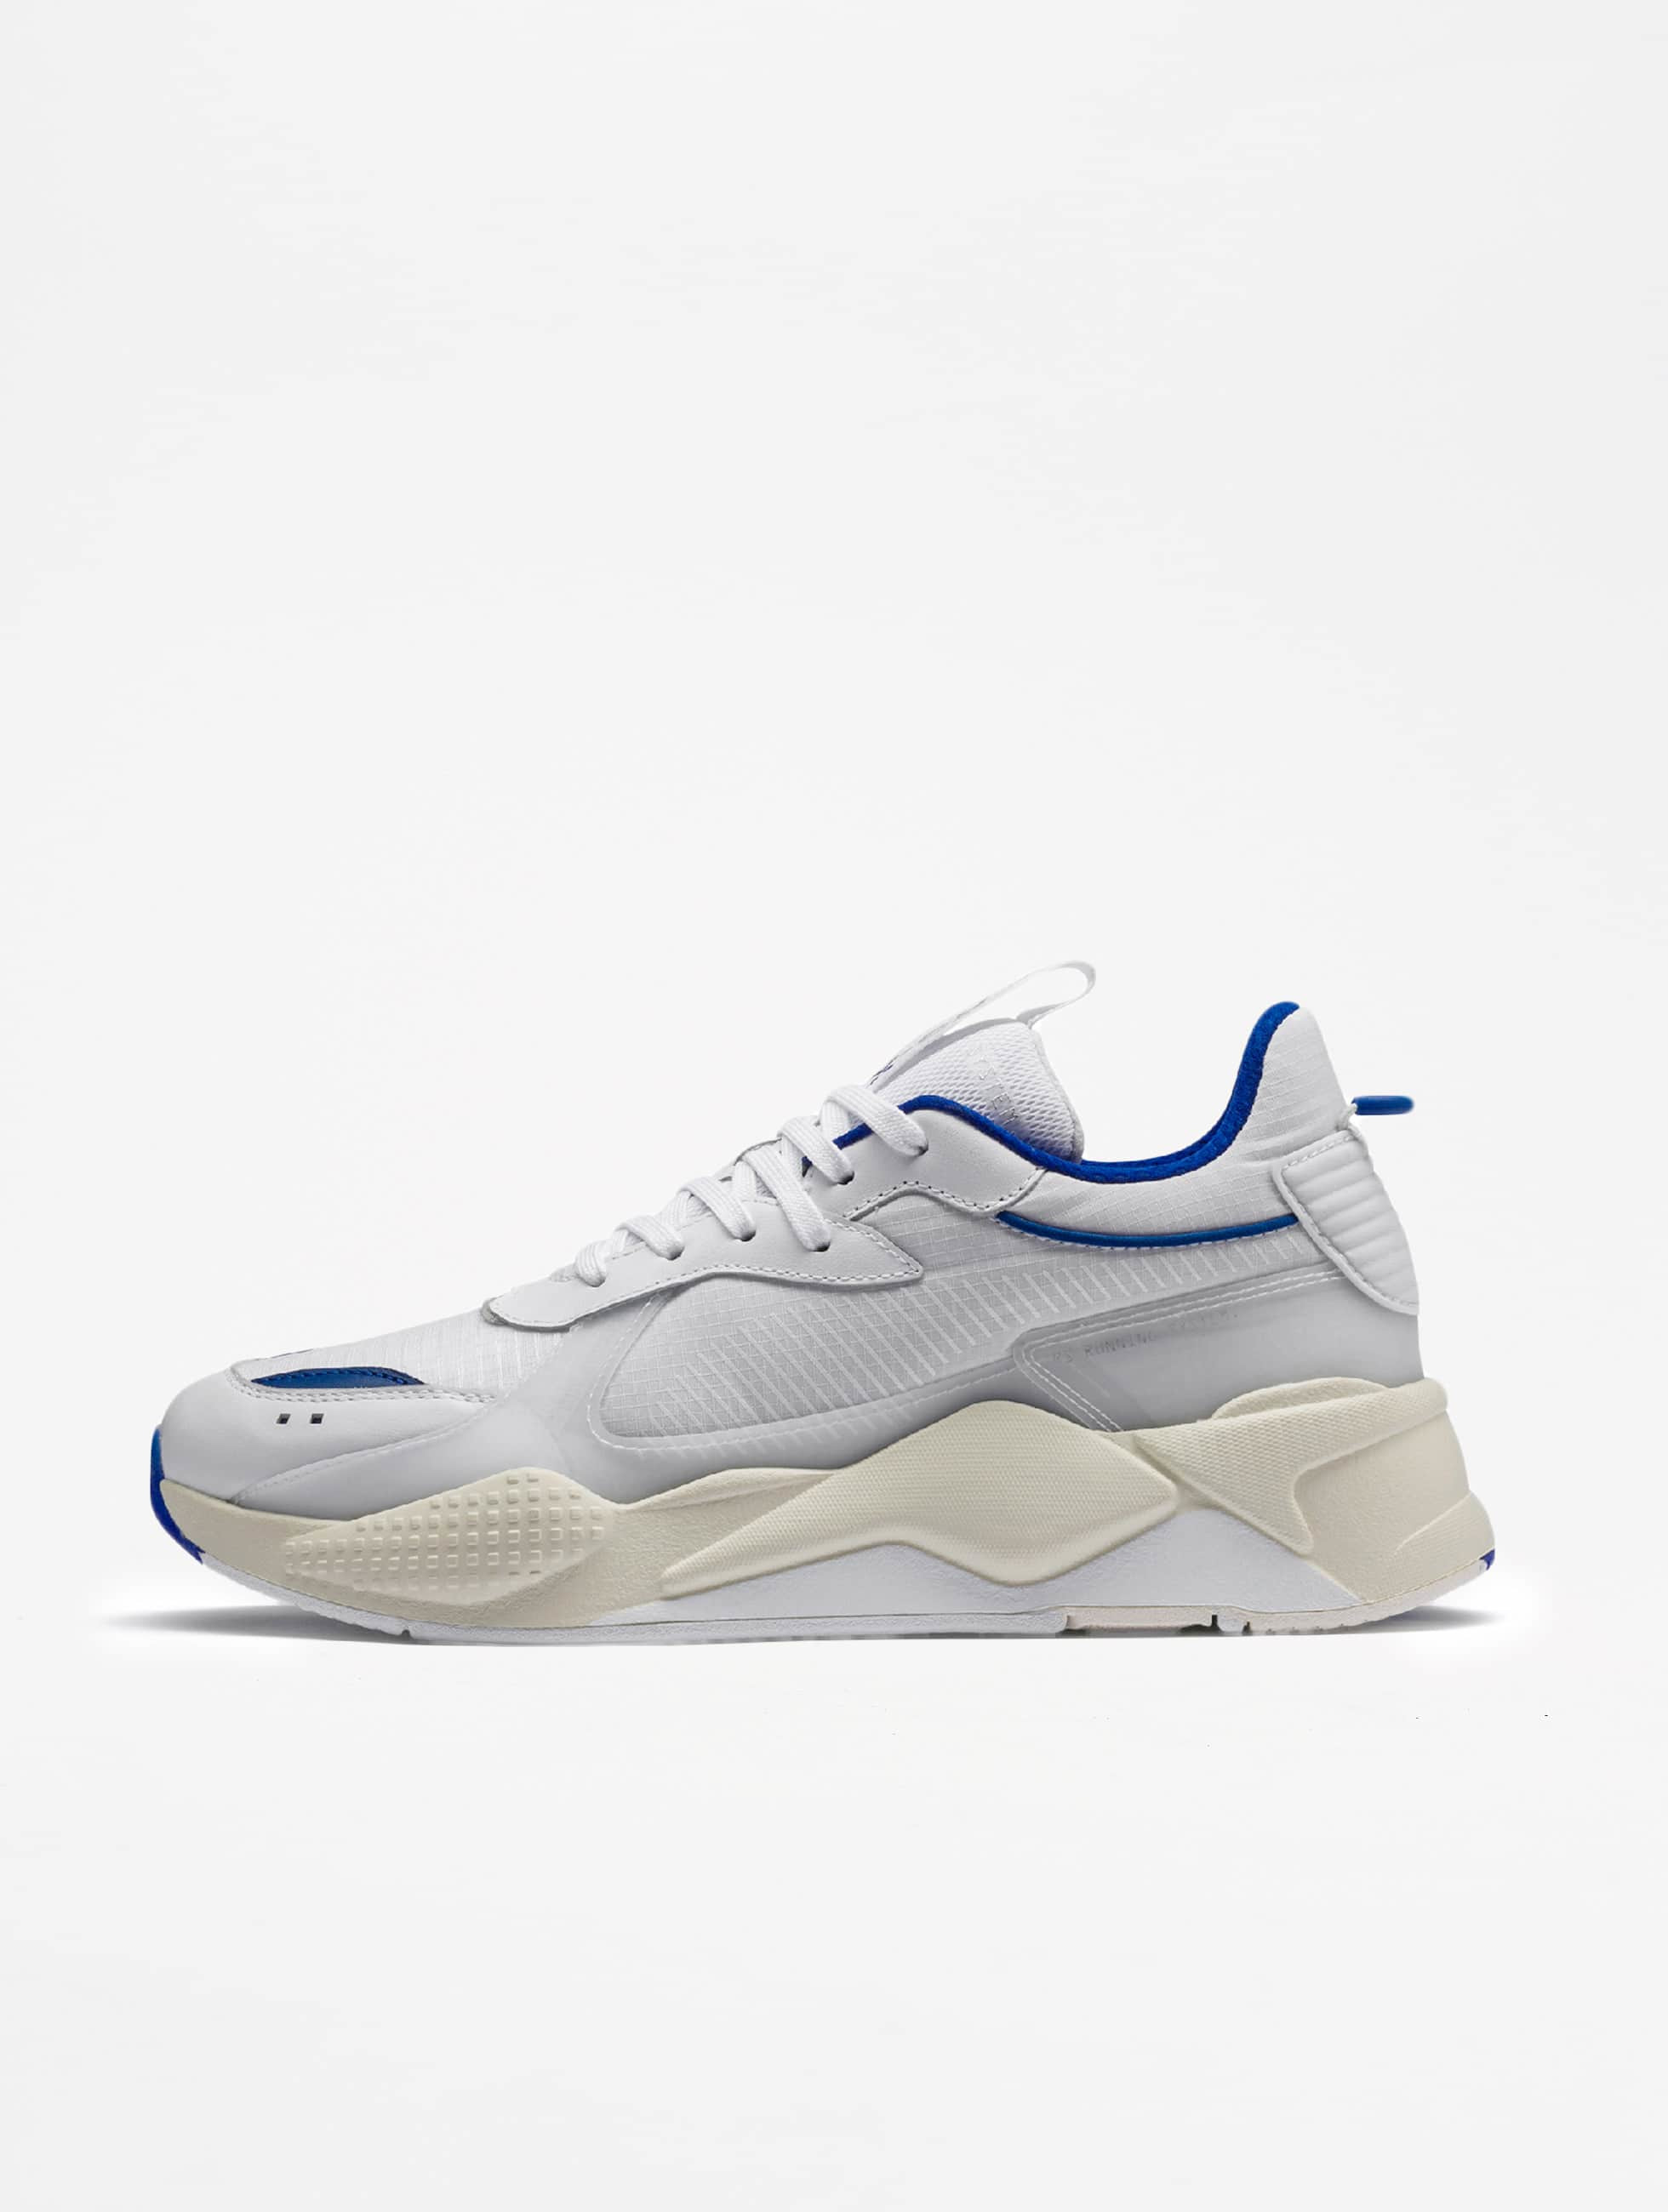 Puma RS X Tech Sneakers Puma WhiteWhisper White